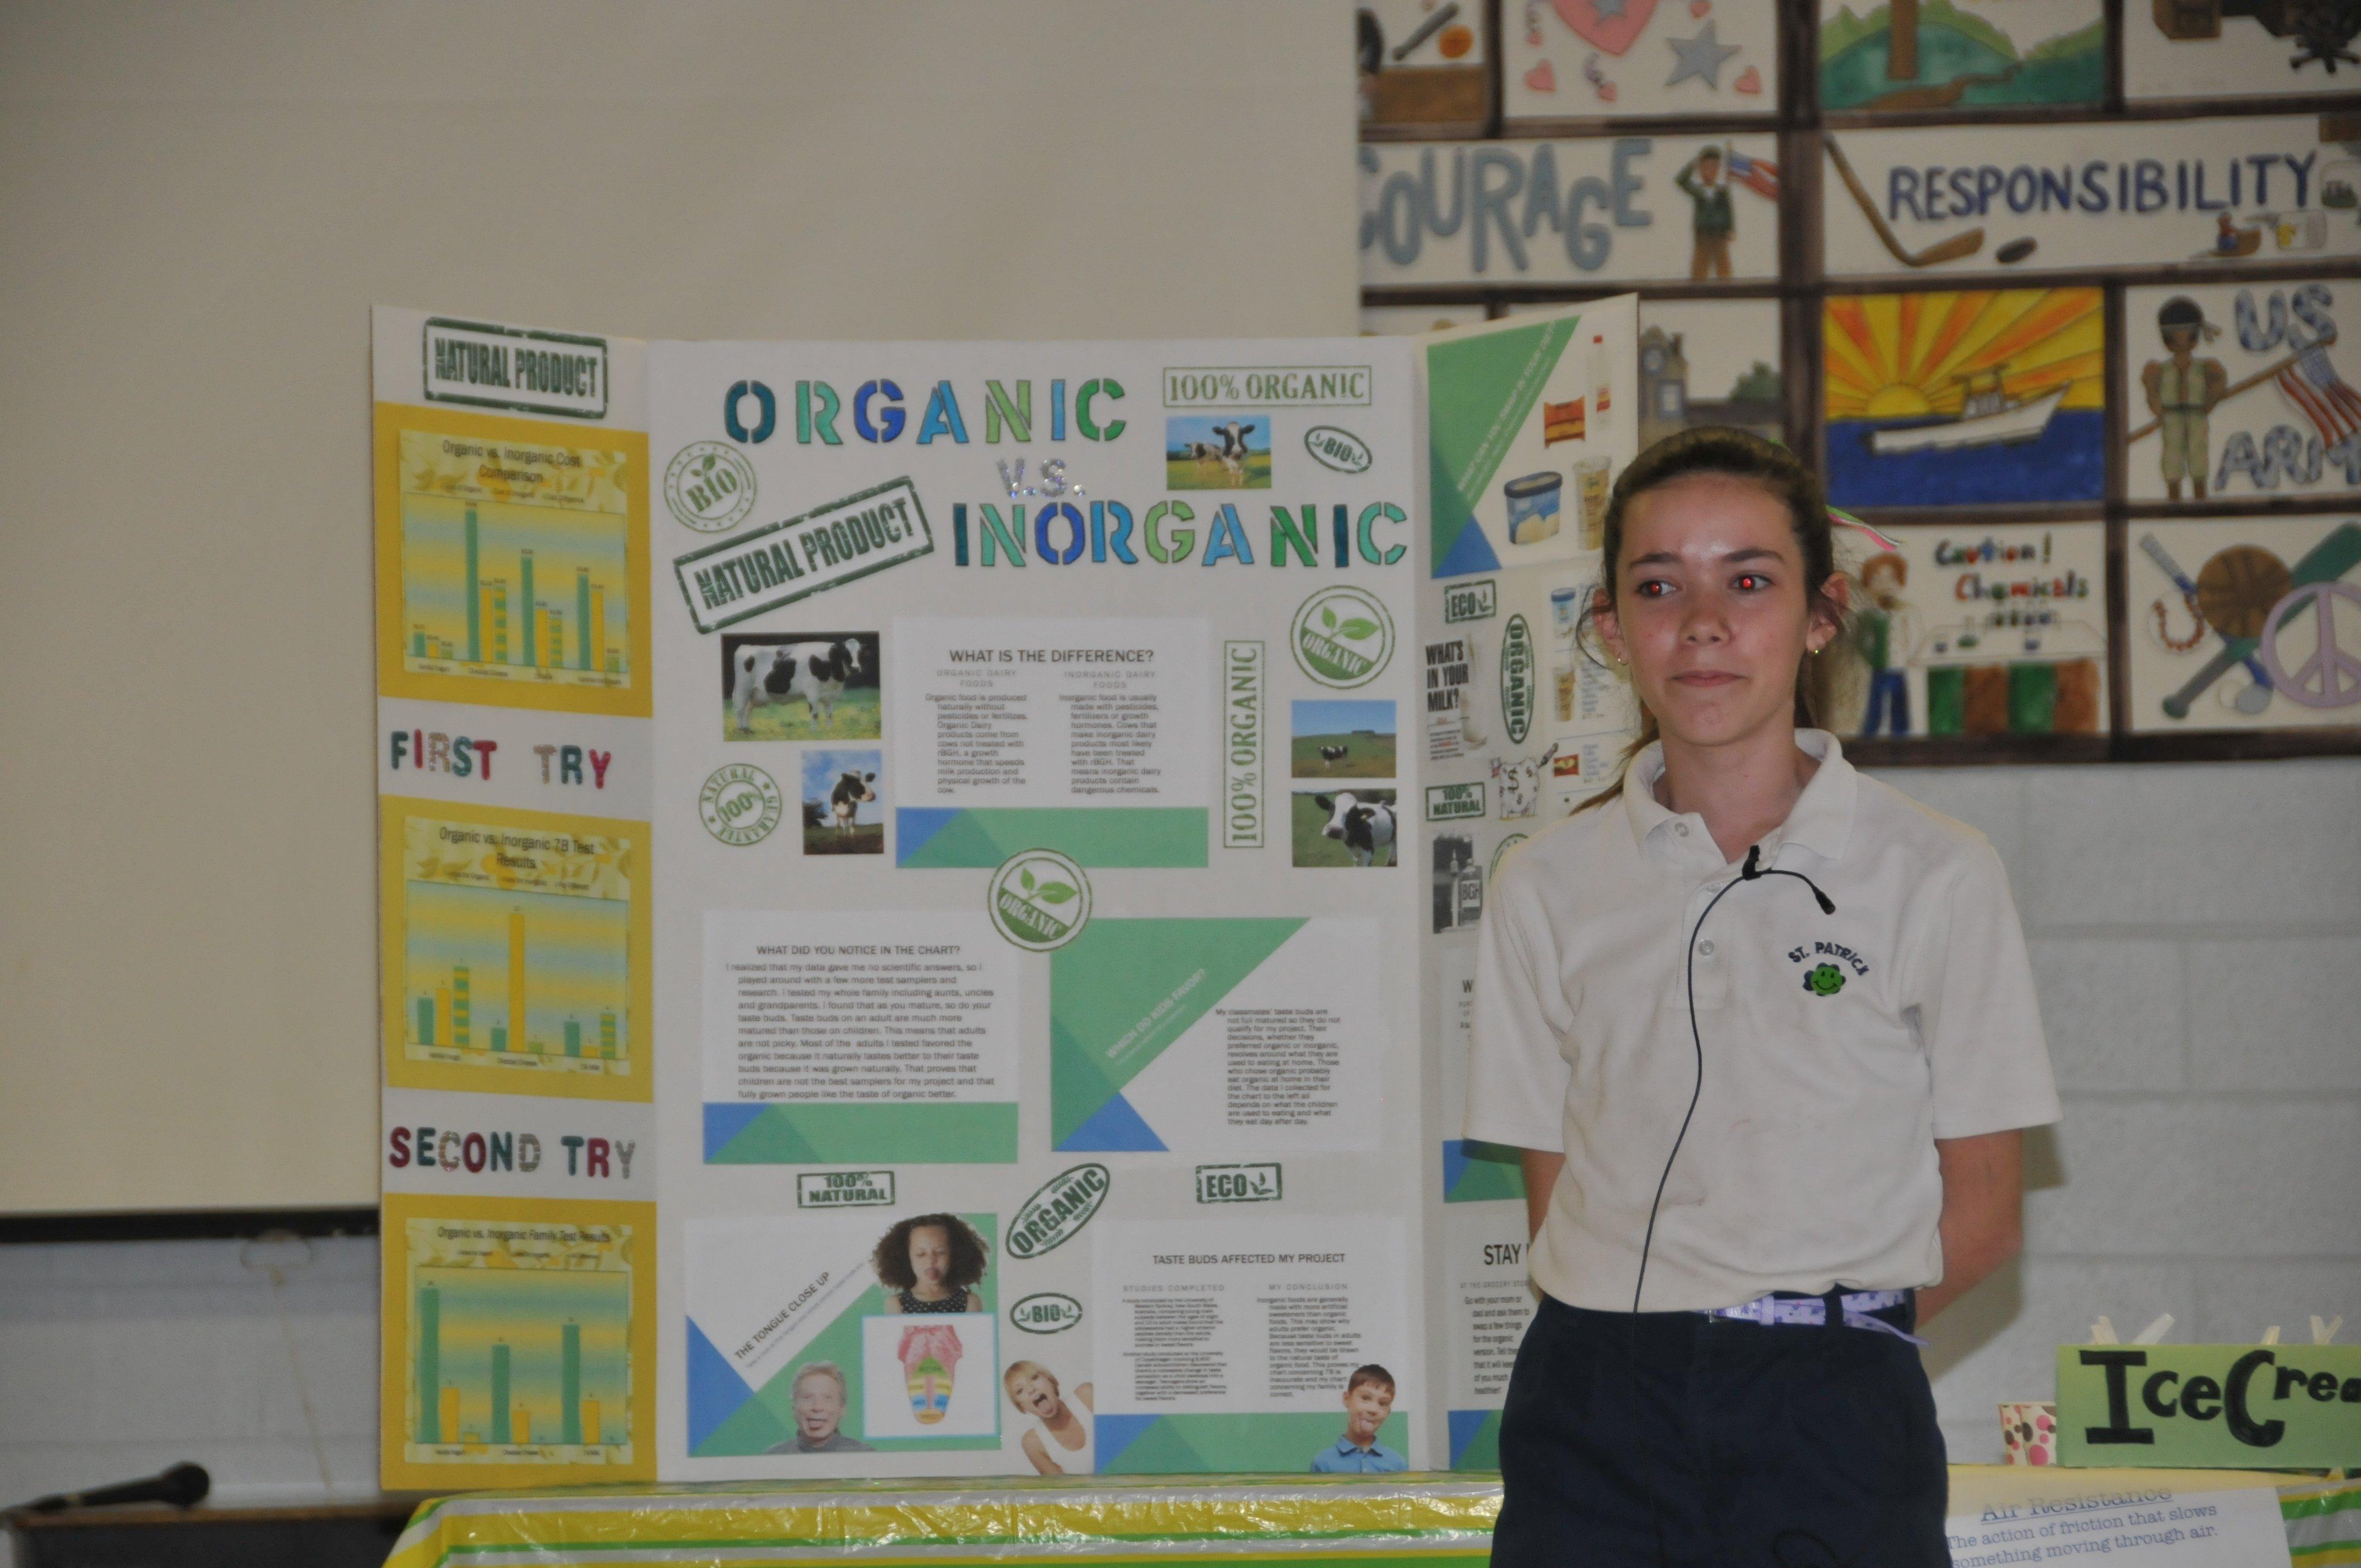 10 Famous Seventh Grade Science Project Ideas fascinating seventh grade science experiments for your 7th grade 2 2020